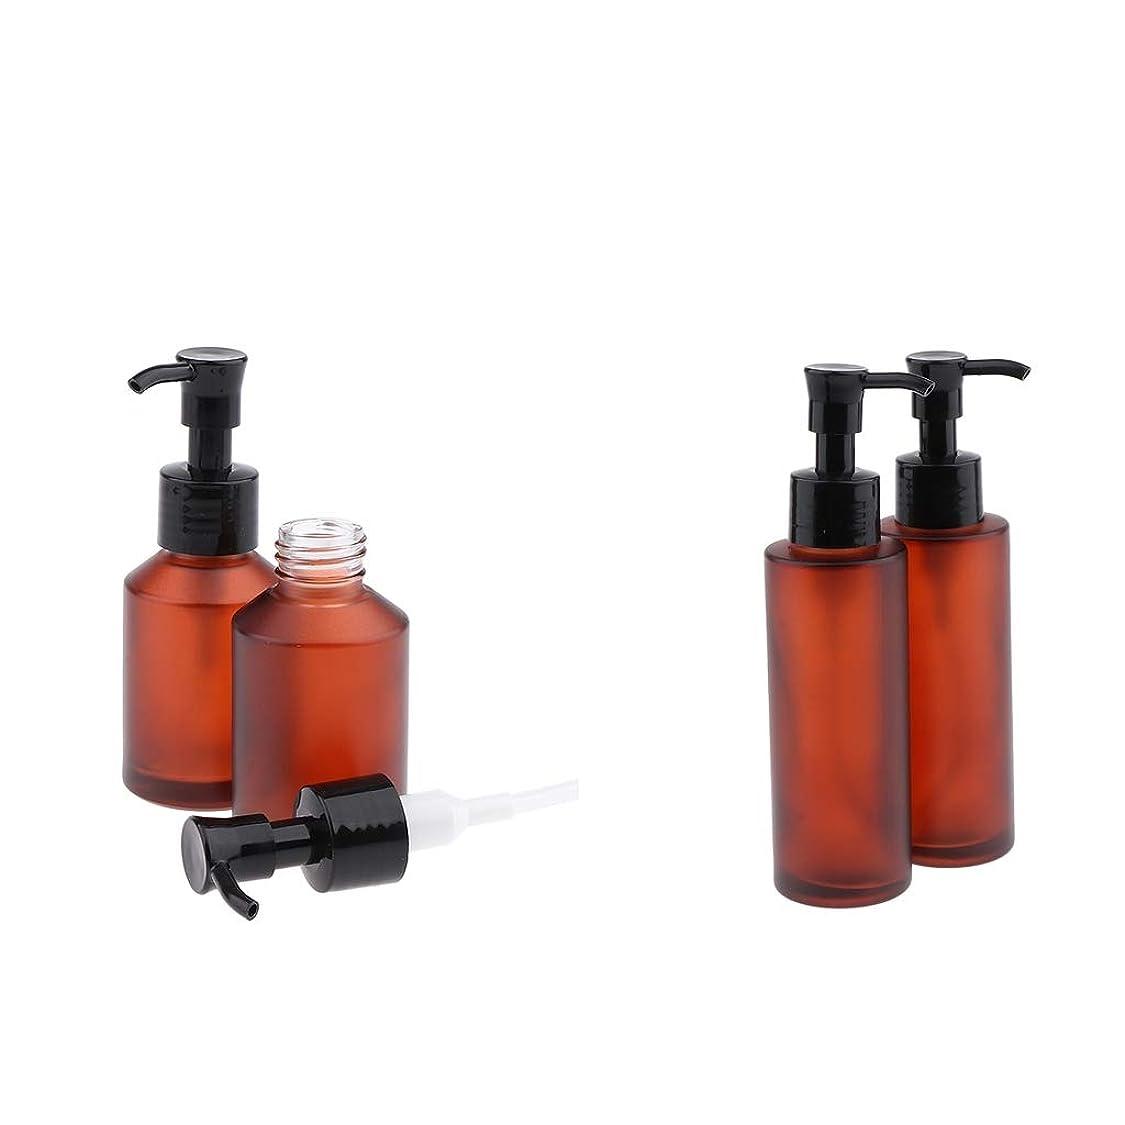 P Prettyia 4個 空 ガラス ポンプボトル 詰め替え式 化粧品ボトル ローションボトル 100/60ミリリットル